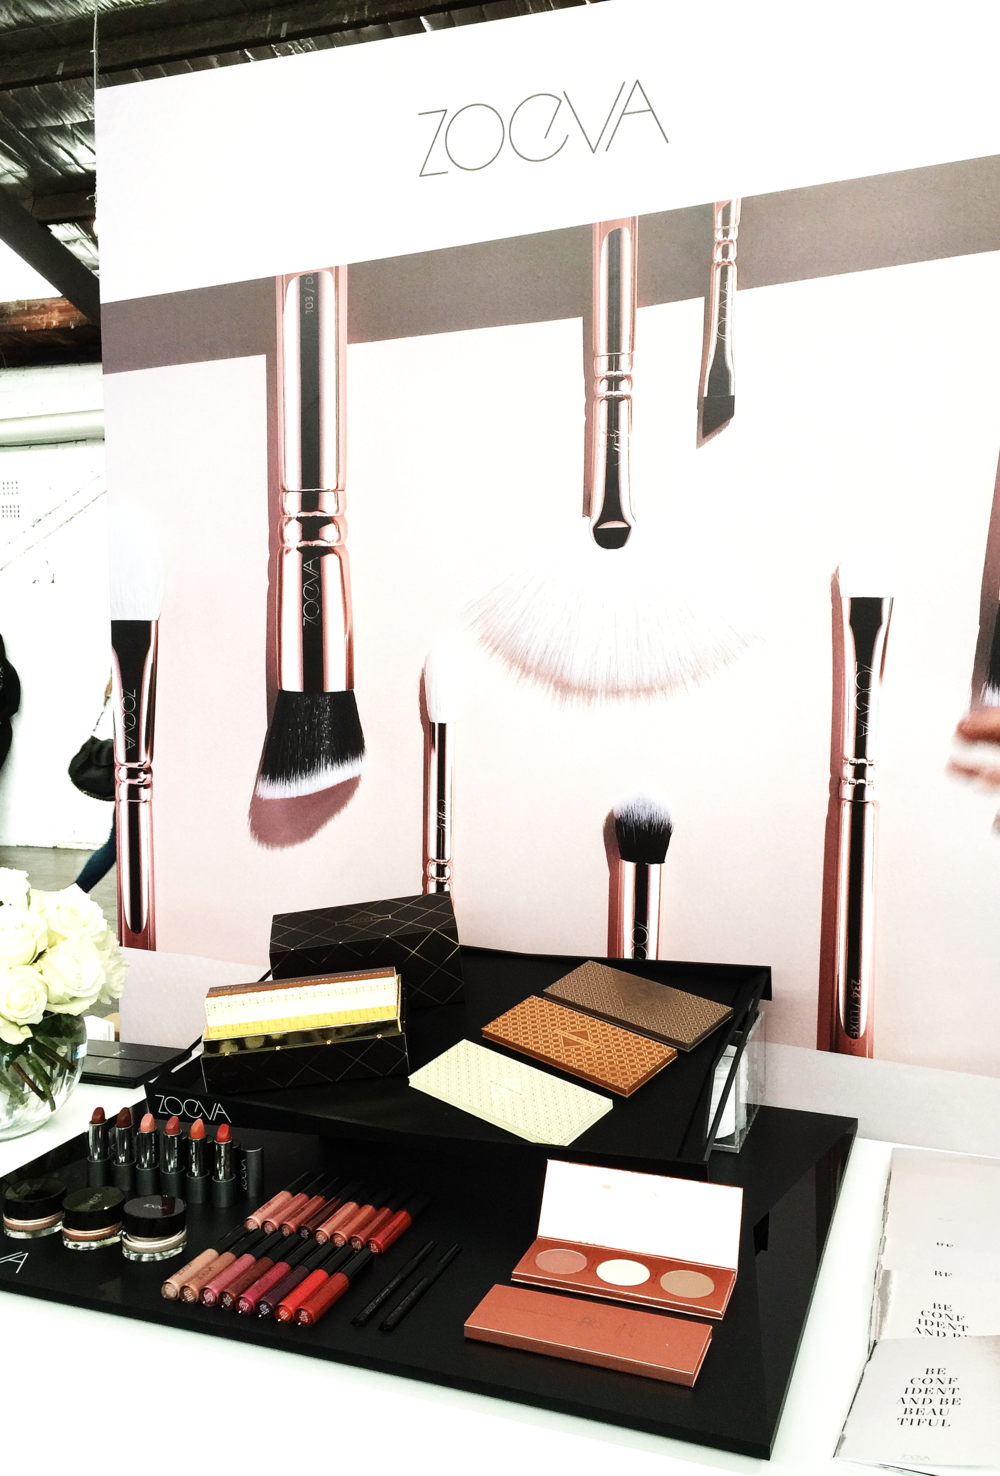 Marisa Robinson Makeup Artist Sephora Showcase Zoeva